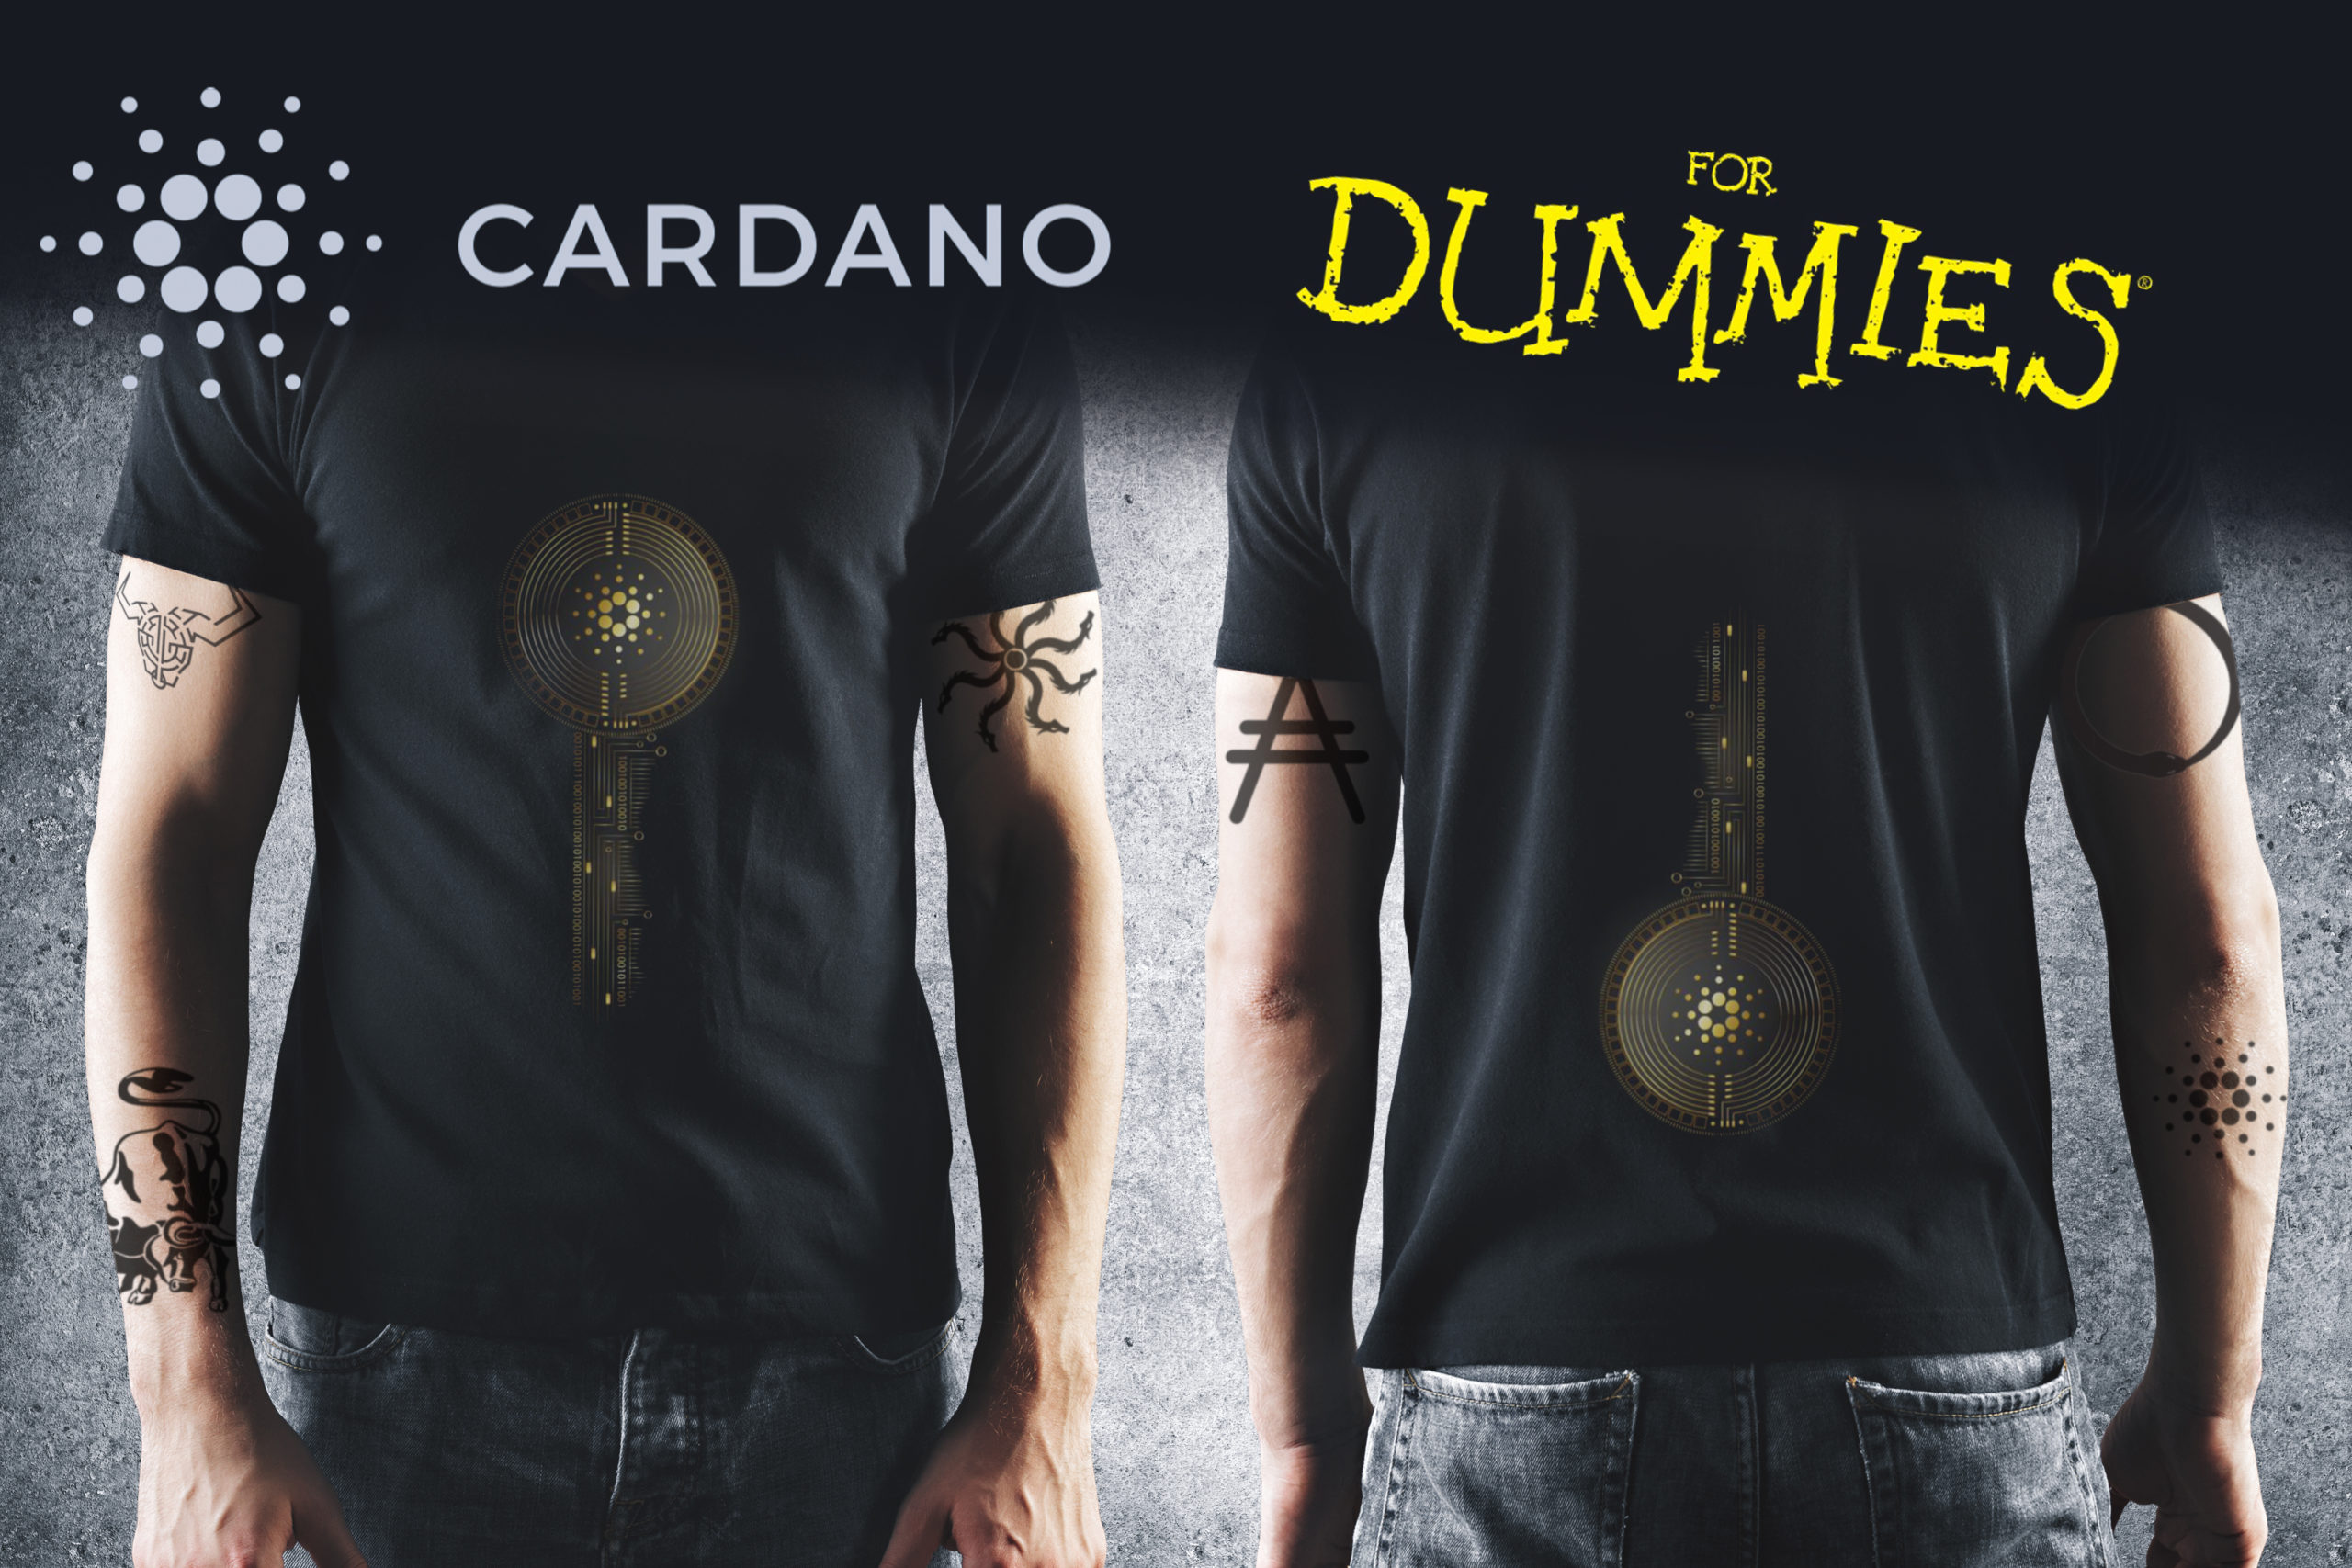 Cardano for Dummies